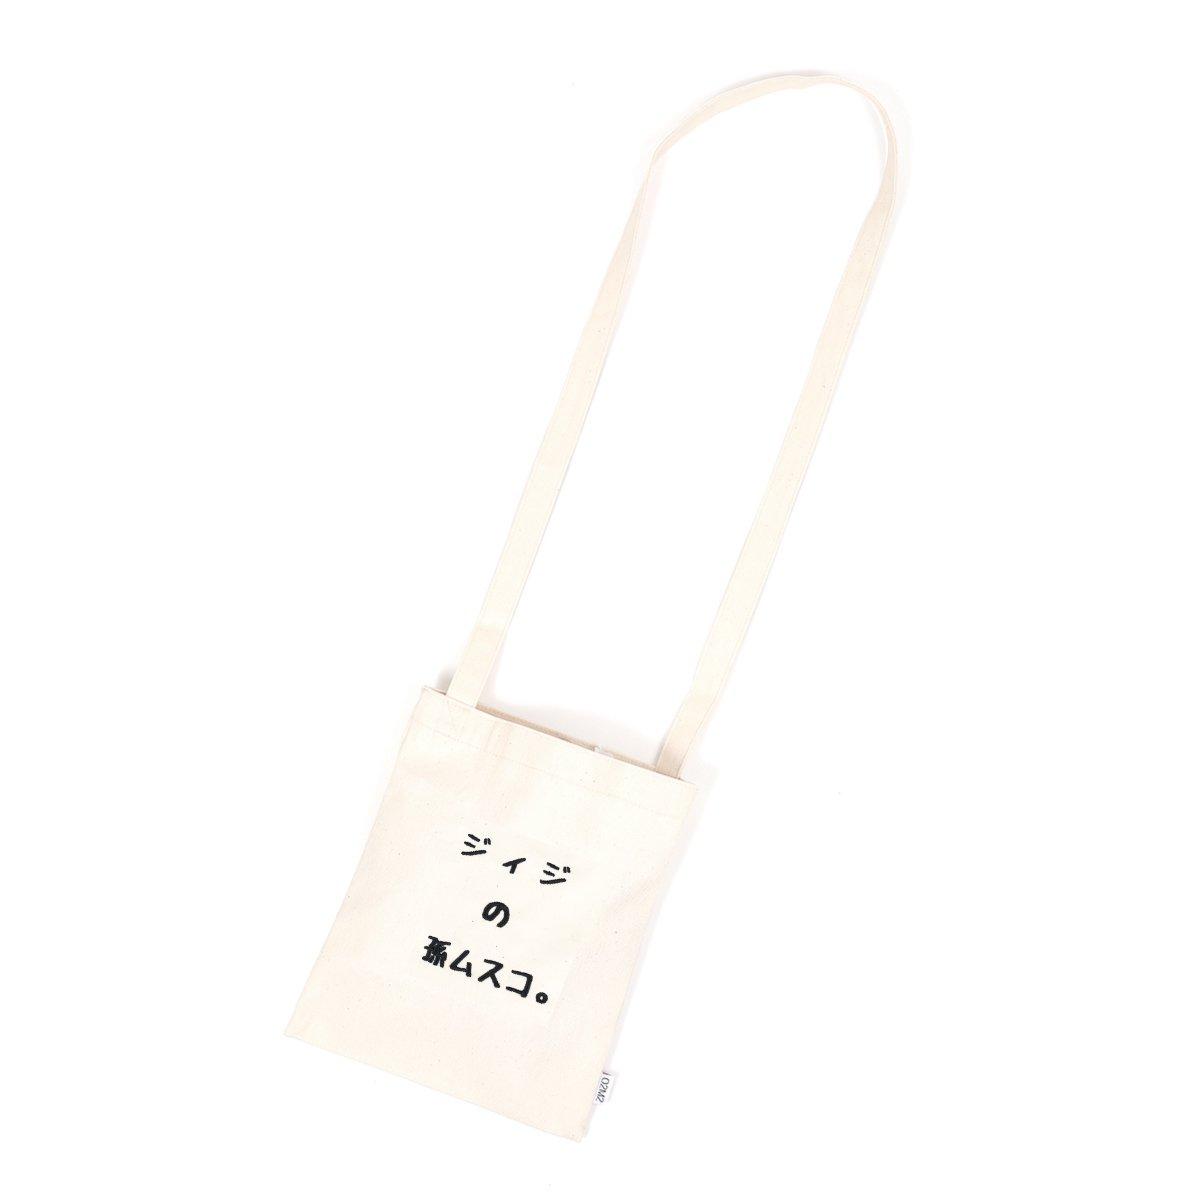 Cotton HF Sacoche(孫・ジィジ&バァバシリーズ) 詳細画像10